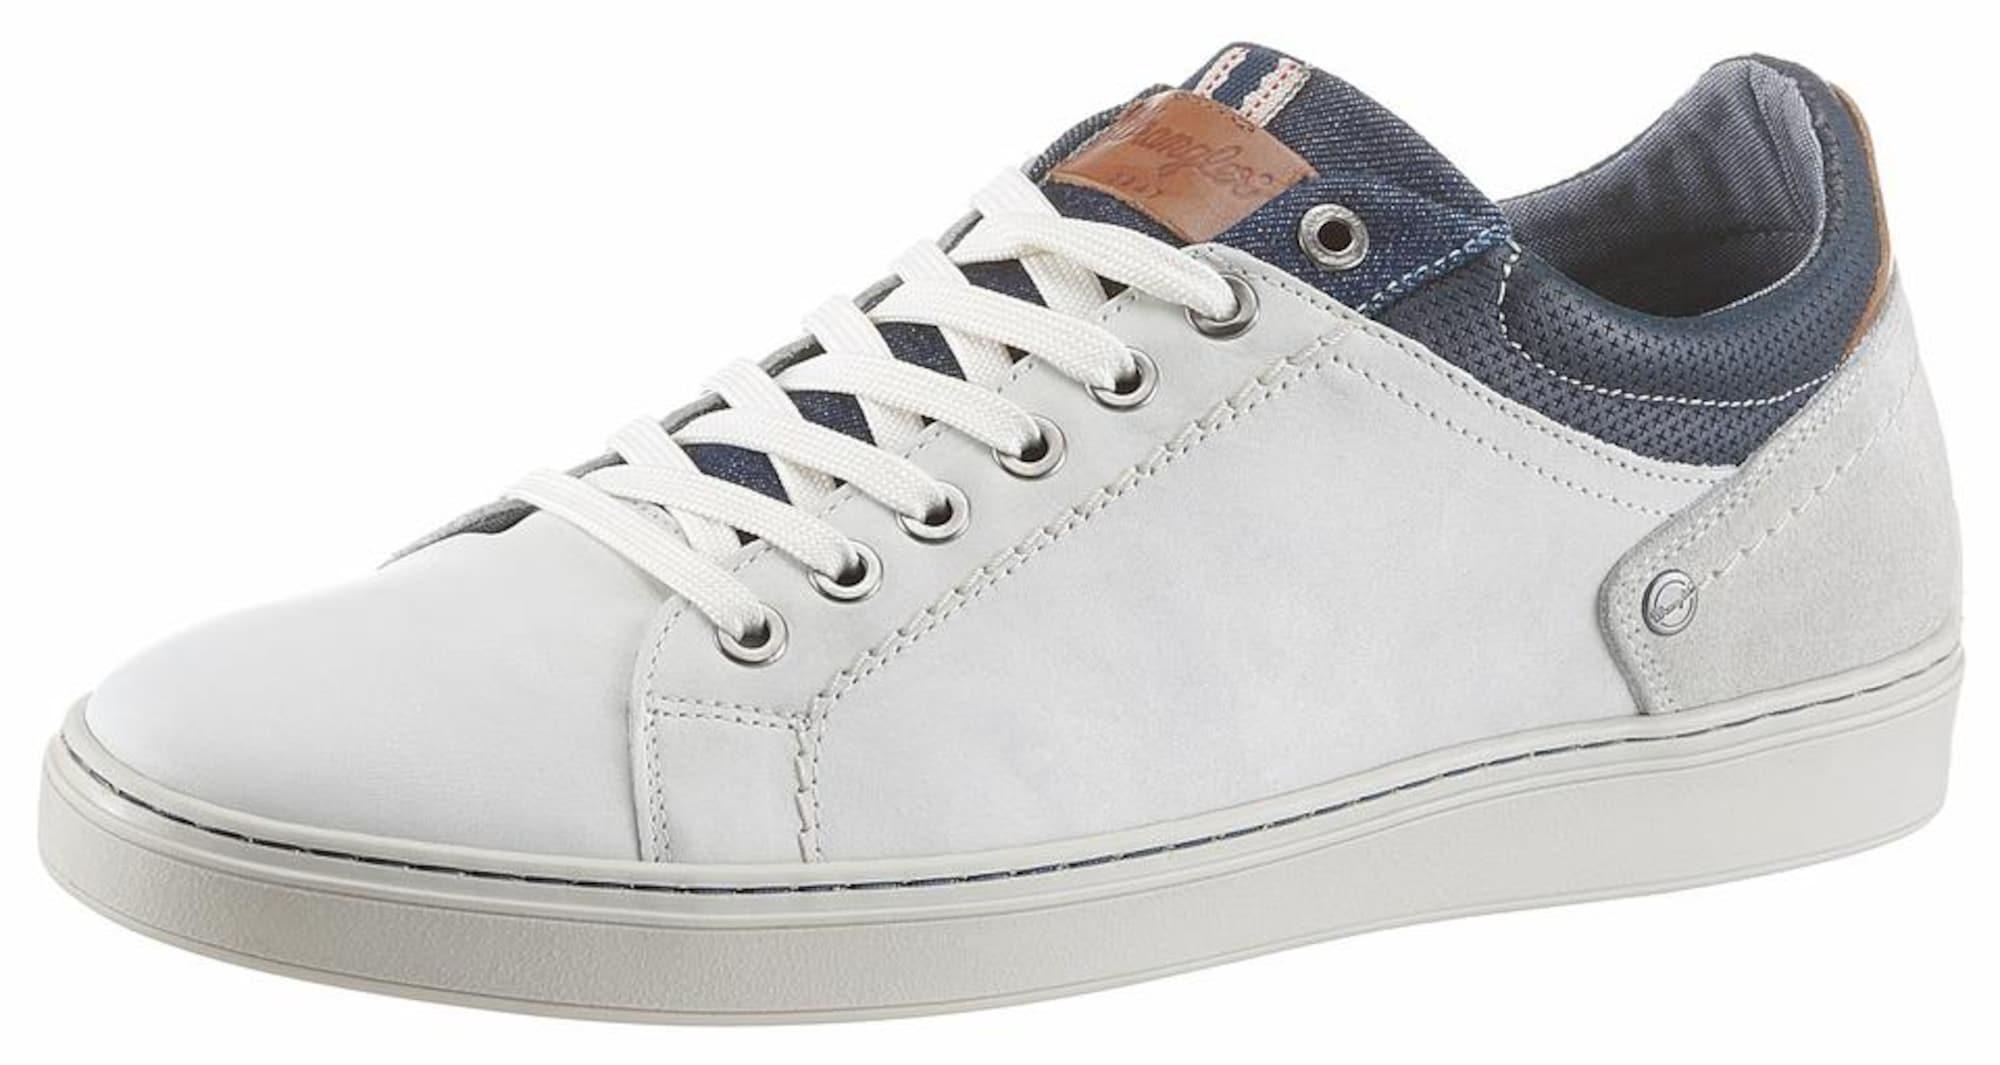 AboutYou   SALE Herren WRANGLER WRANGLER Sneaker Owen Derby